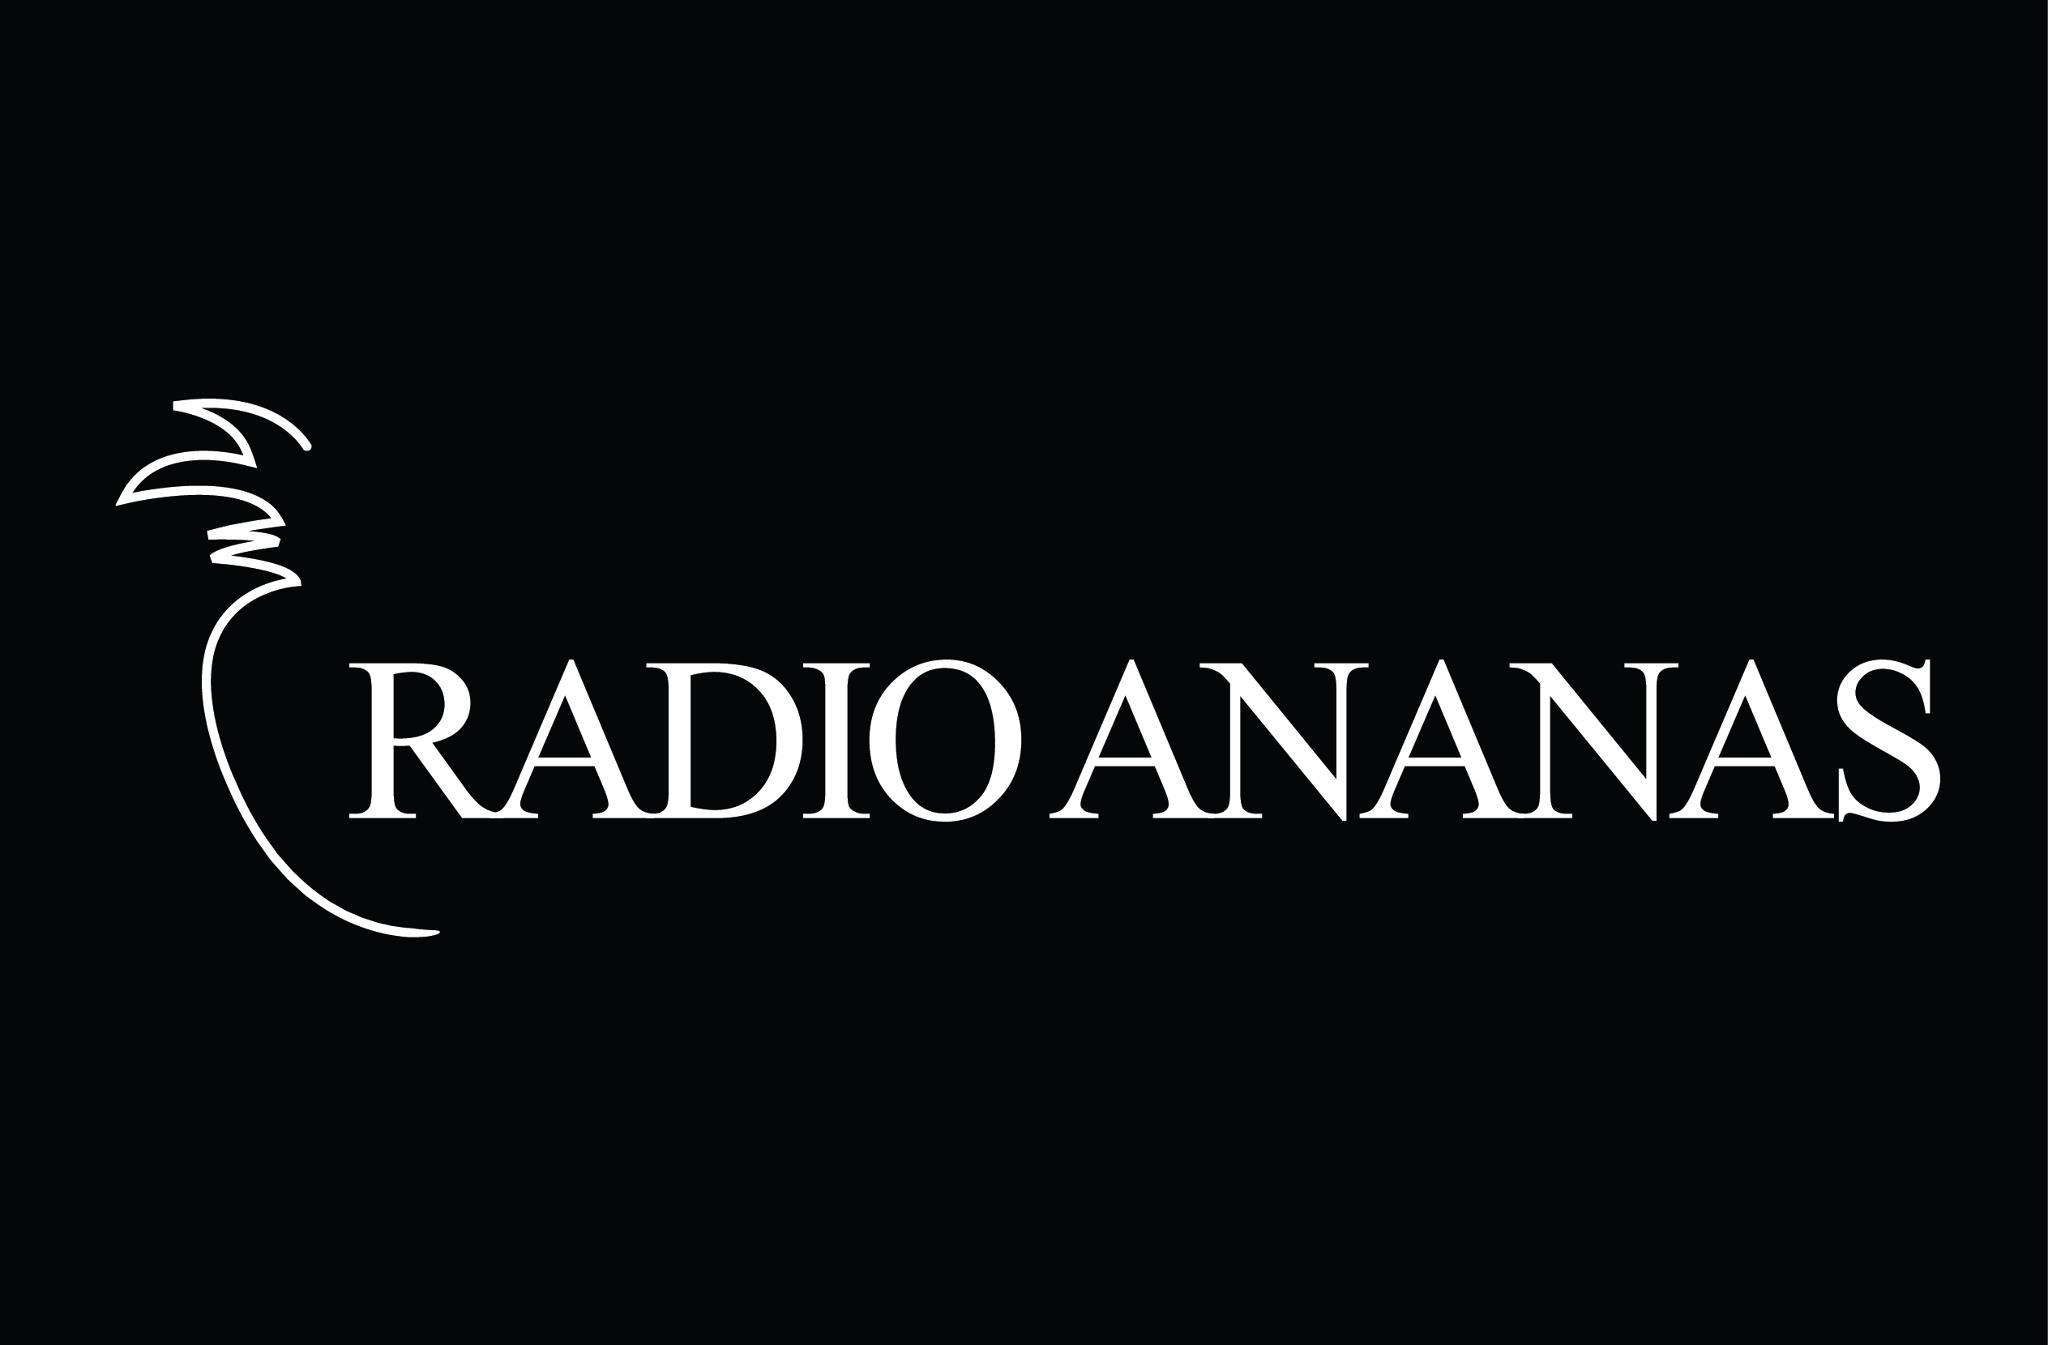 radio ananas logo facebook